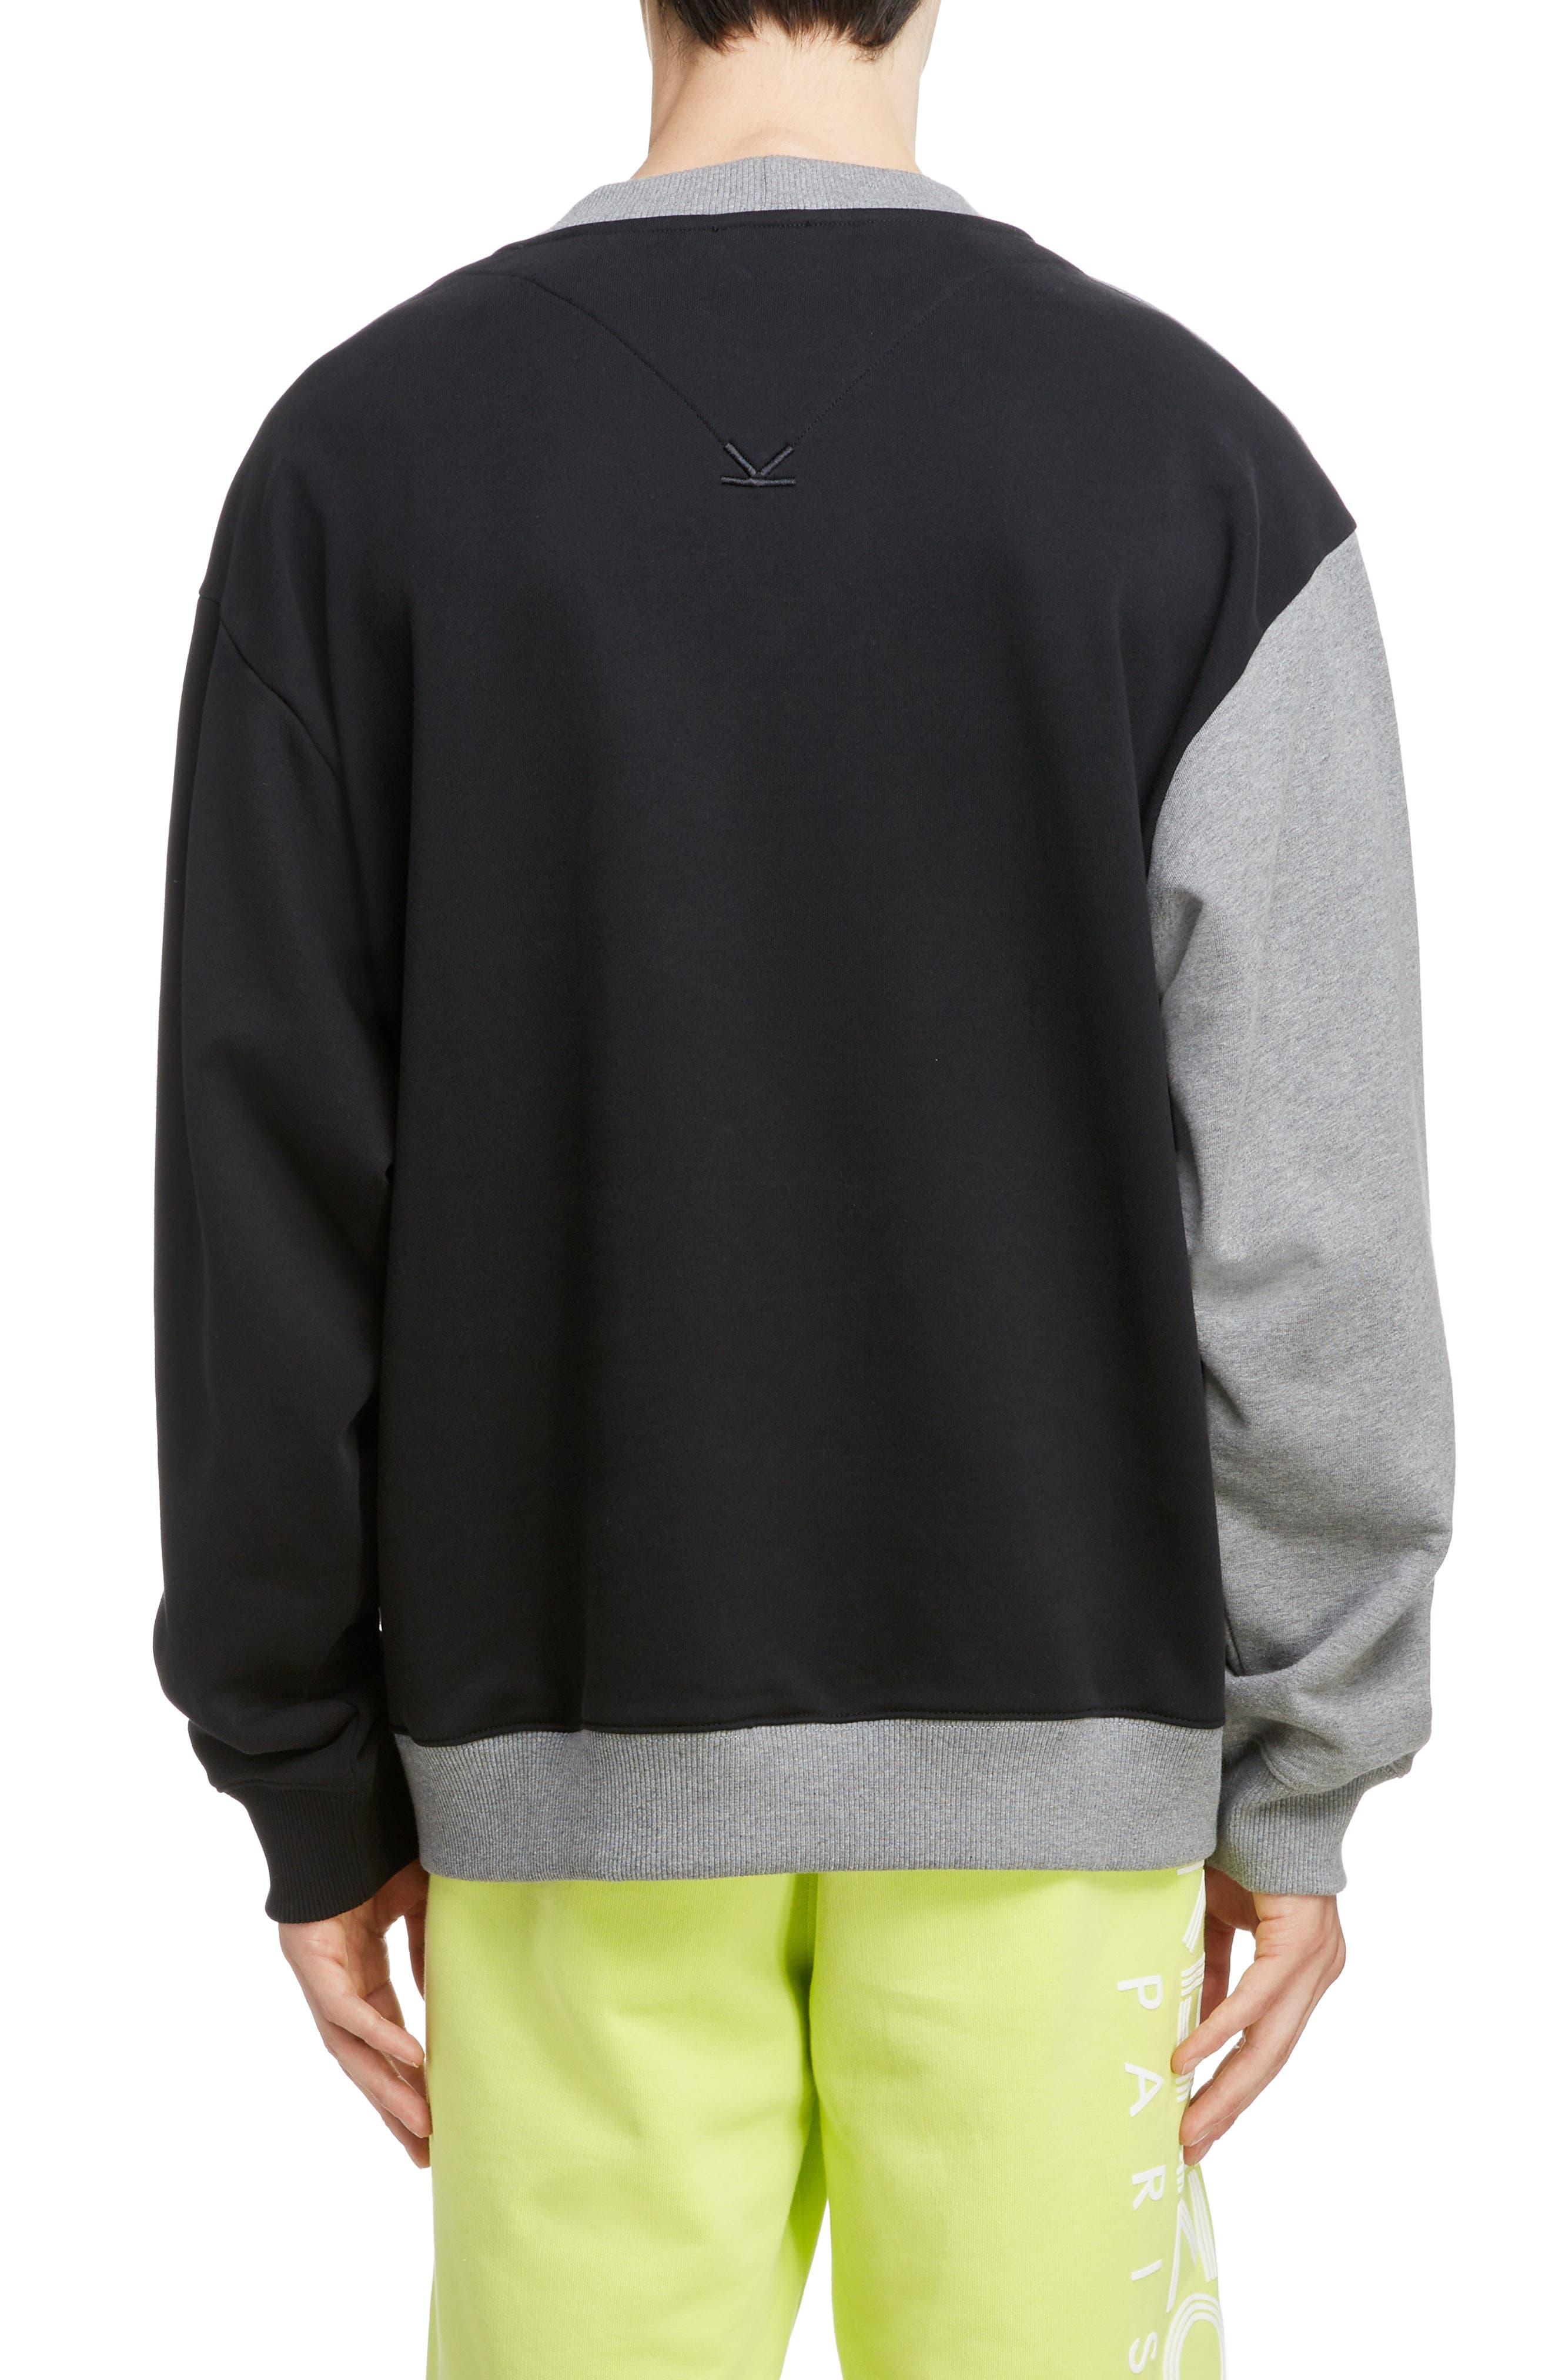 KENZO, Oversize Colorblock Sweatshirt, Alternate thumbnail 2, color, DOVE GREY